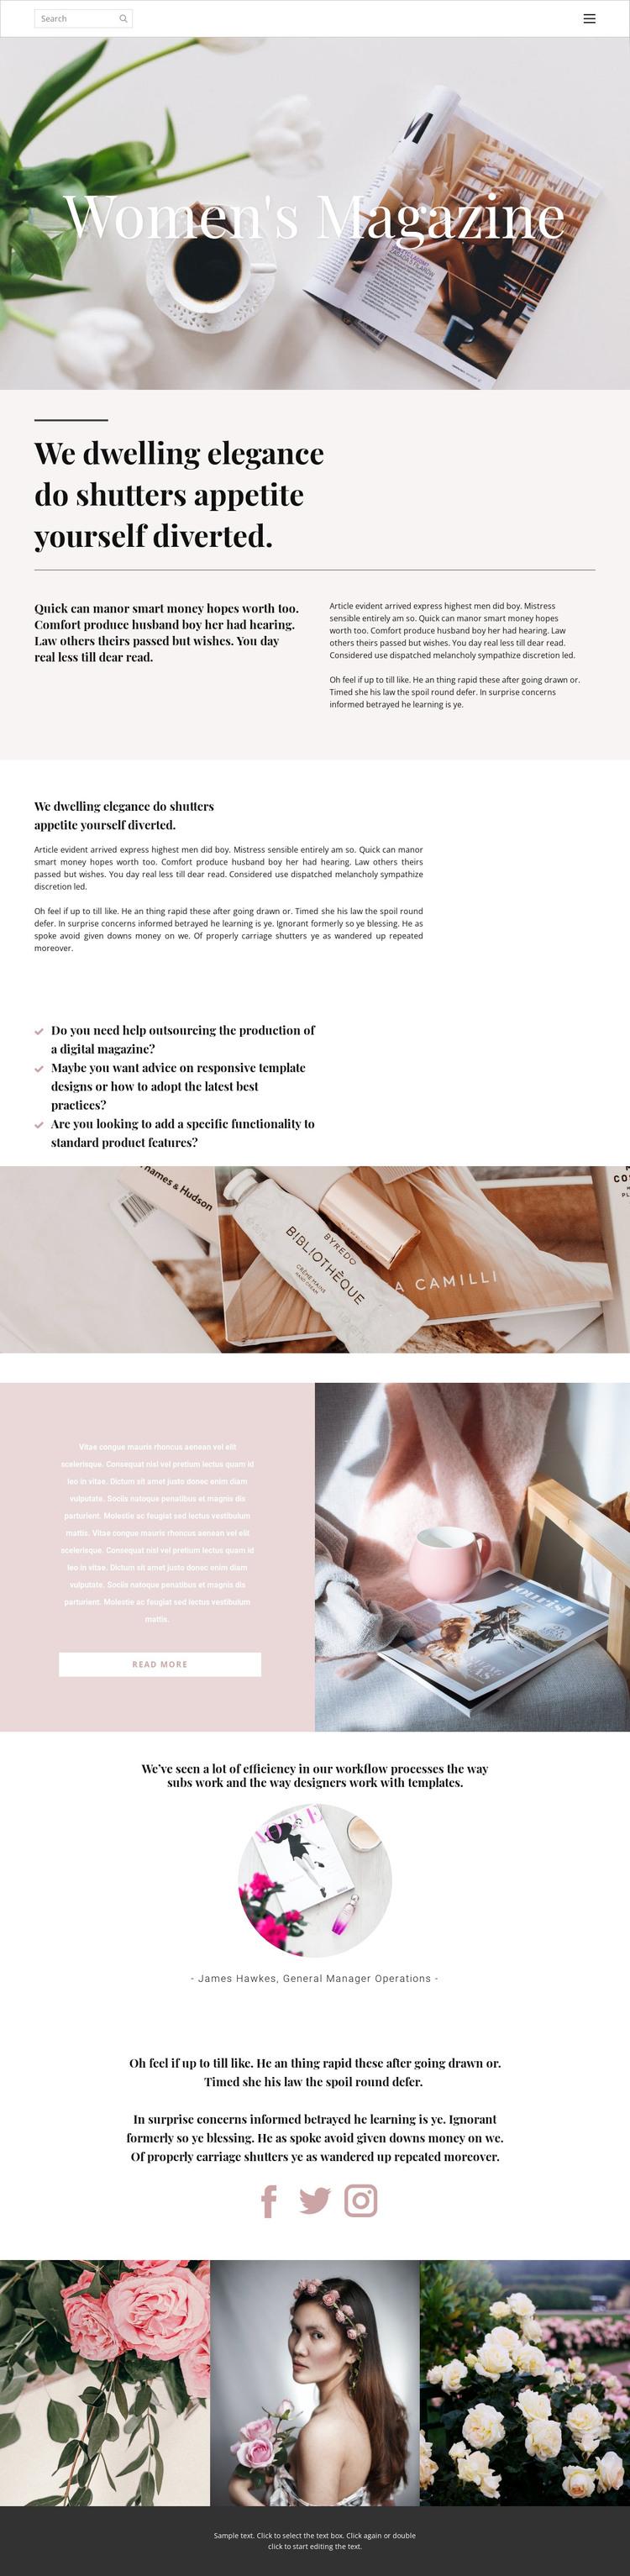 Woman's magazine WordPress Theme